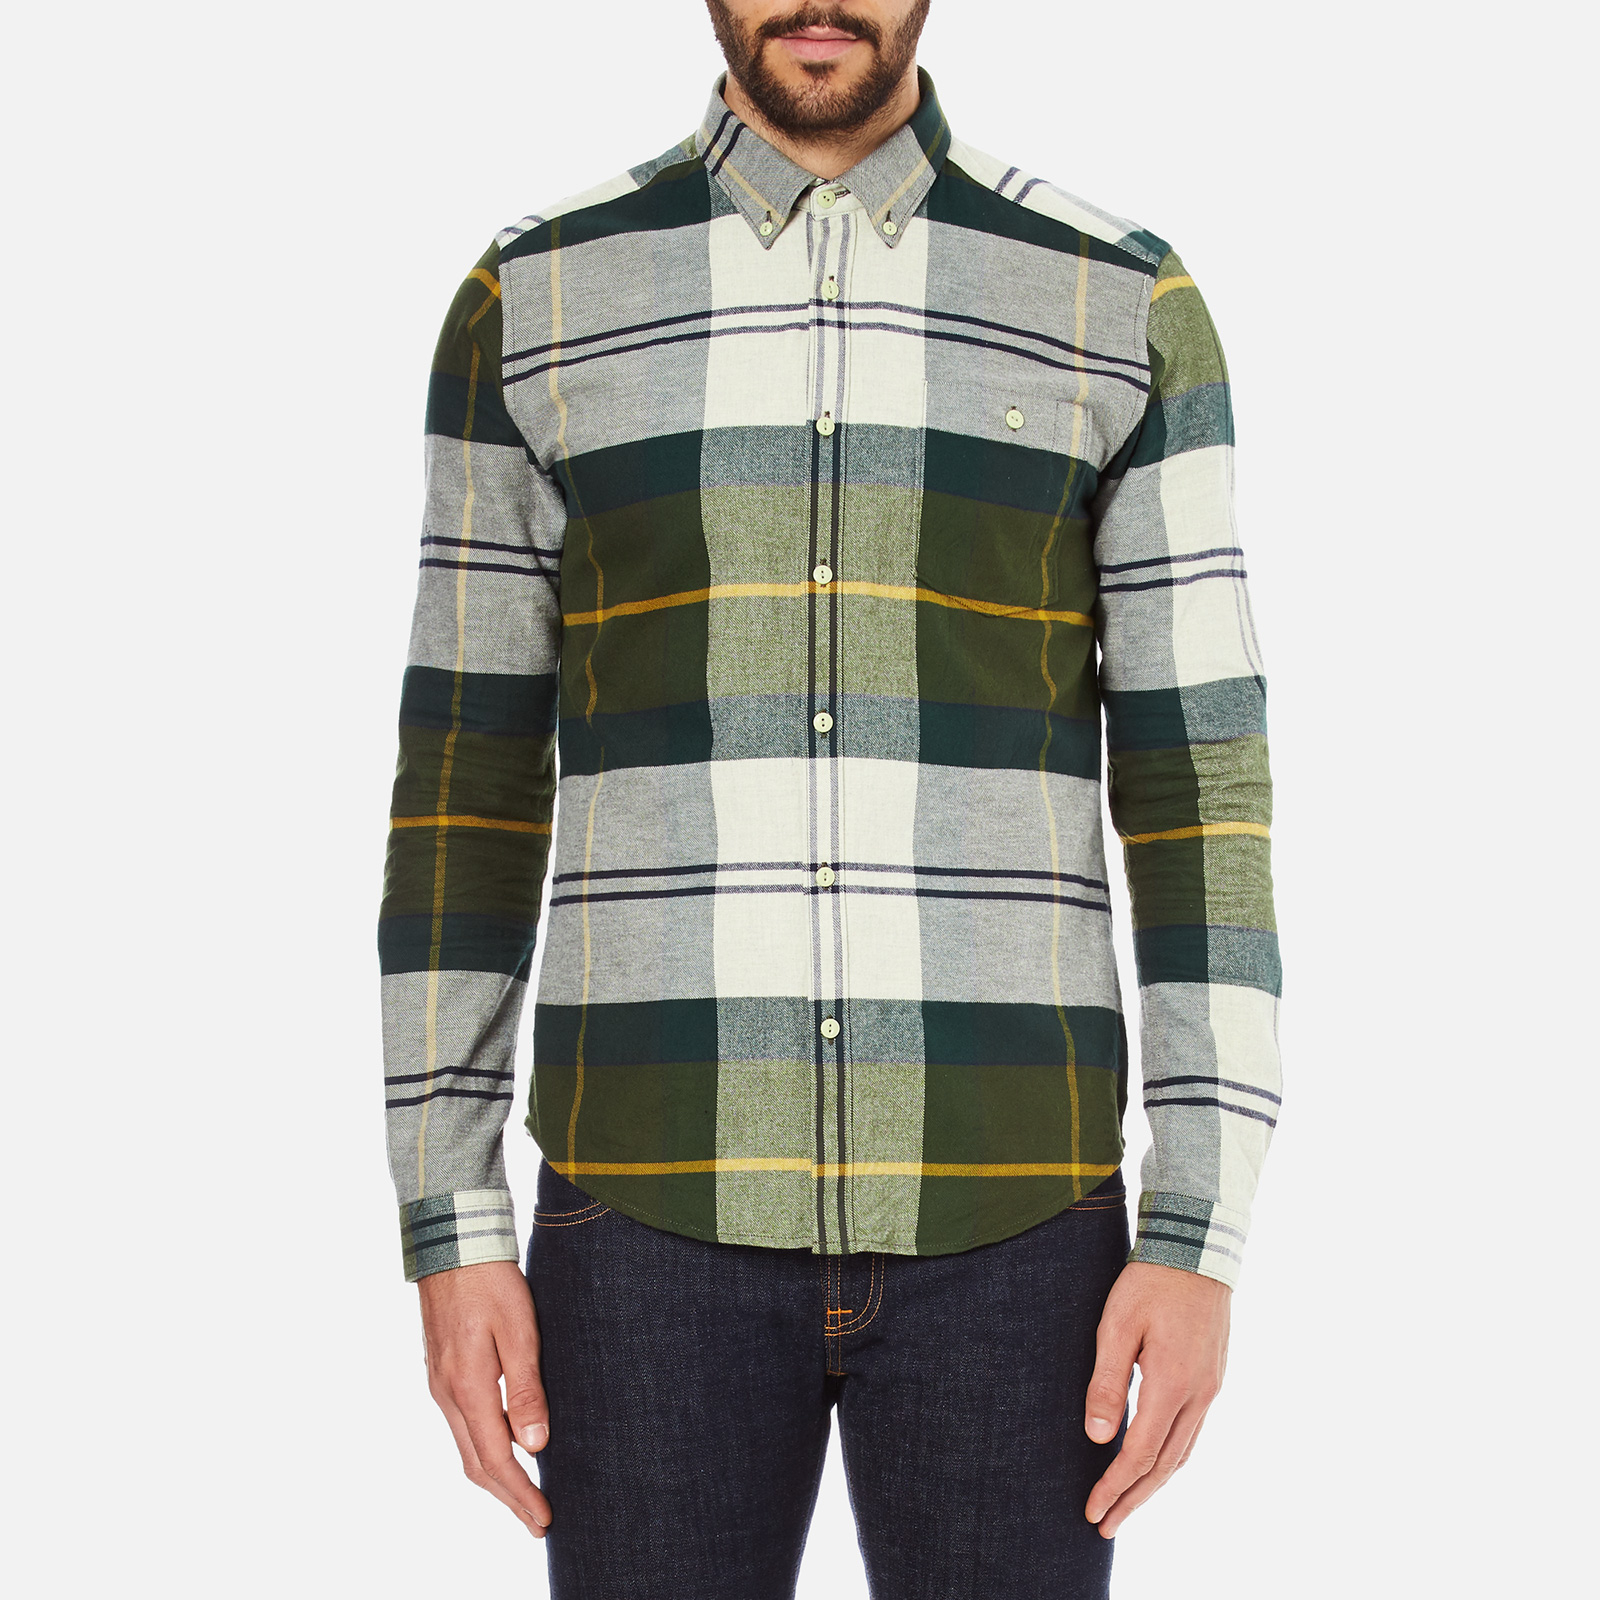 1037f10b25a7b Barbour Men's Johnny Original Tartan Long Sleeve Shirt - Ancient